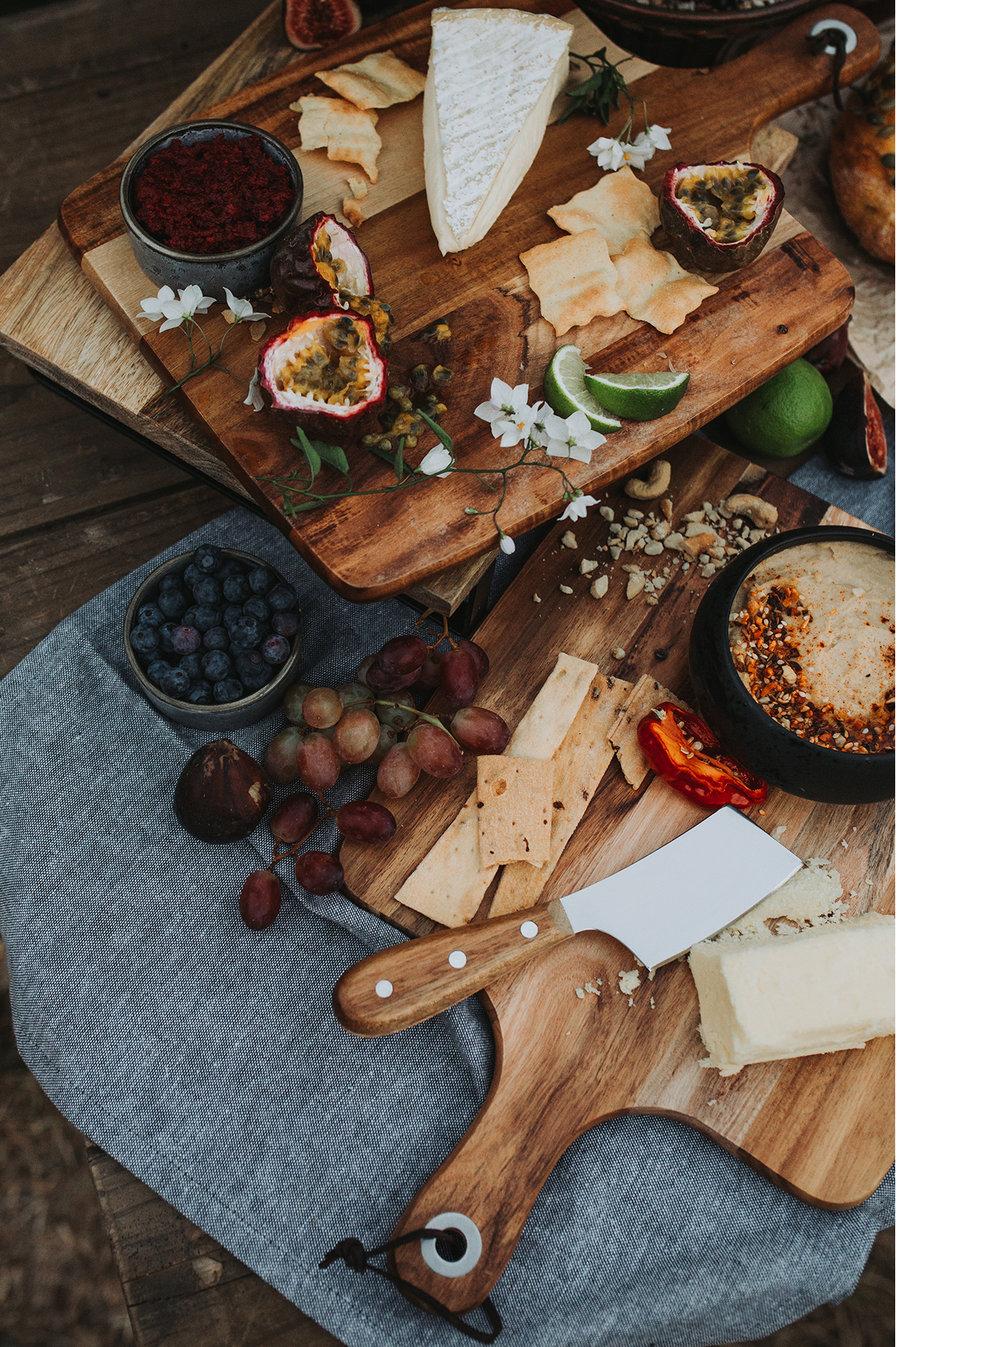 bendigo-catering-grazing-tables.jpg